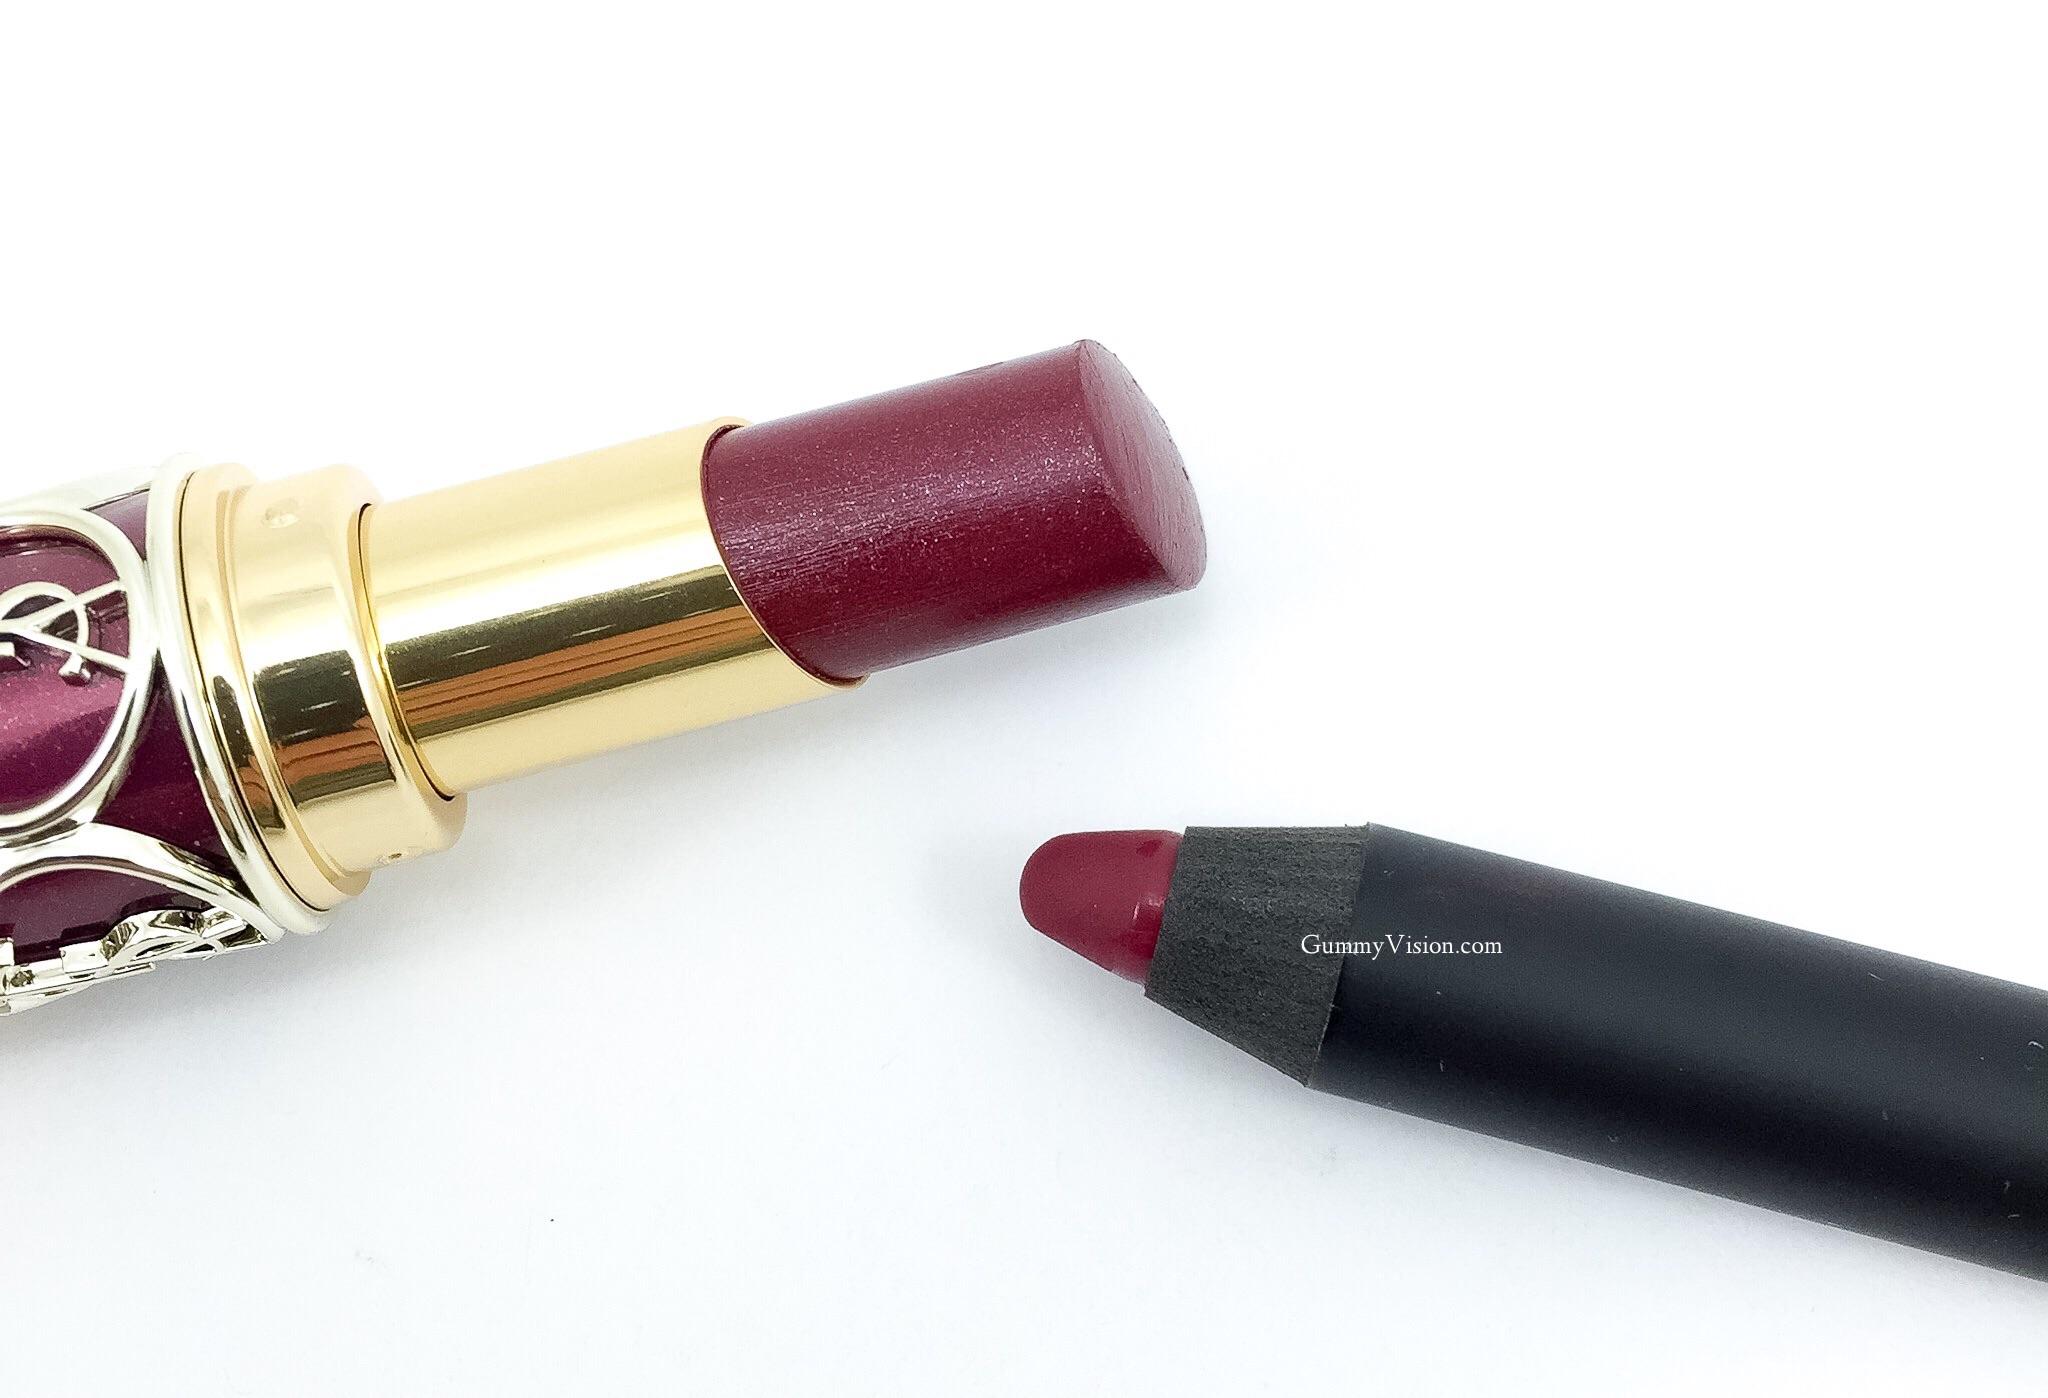 NARS Velvet Matte Lip Pencil In Damned + YSL Rouge Volupte Shine In 2 Pourpre Intouchable - www.gummyvision.com